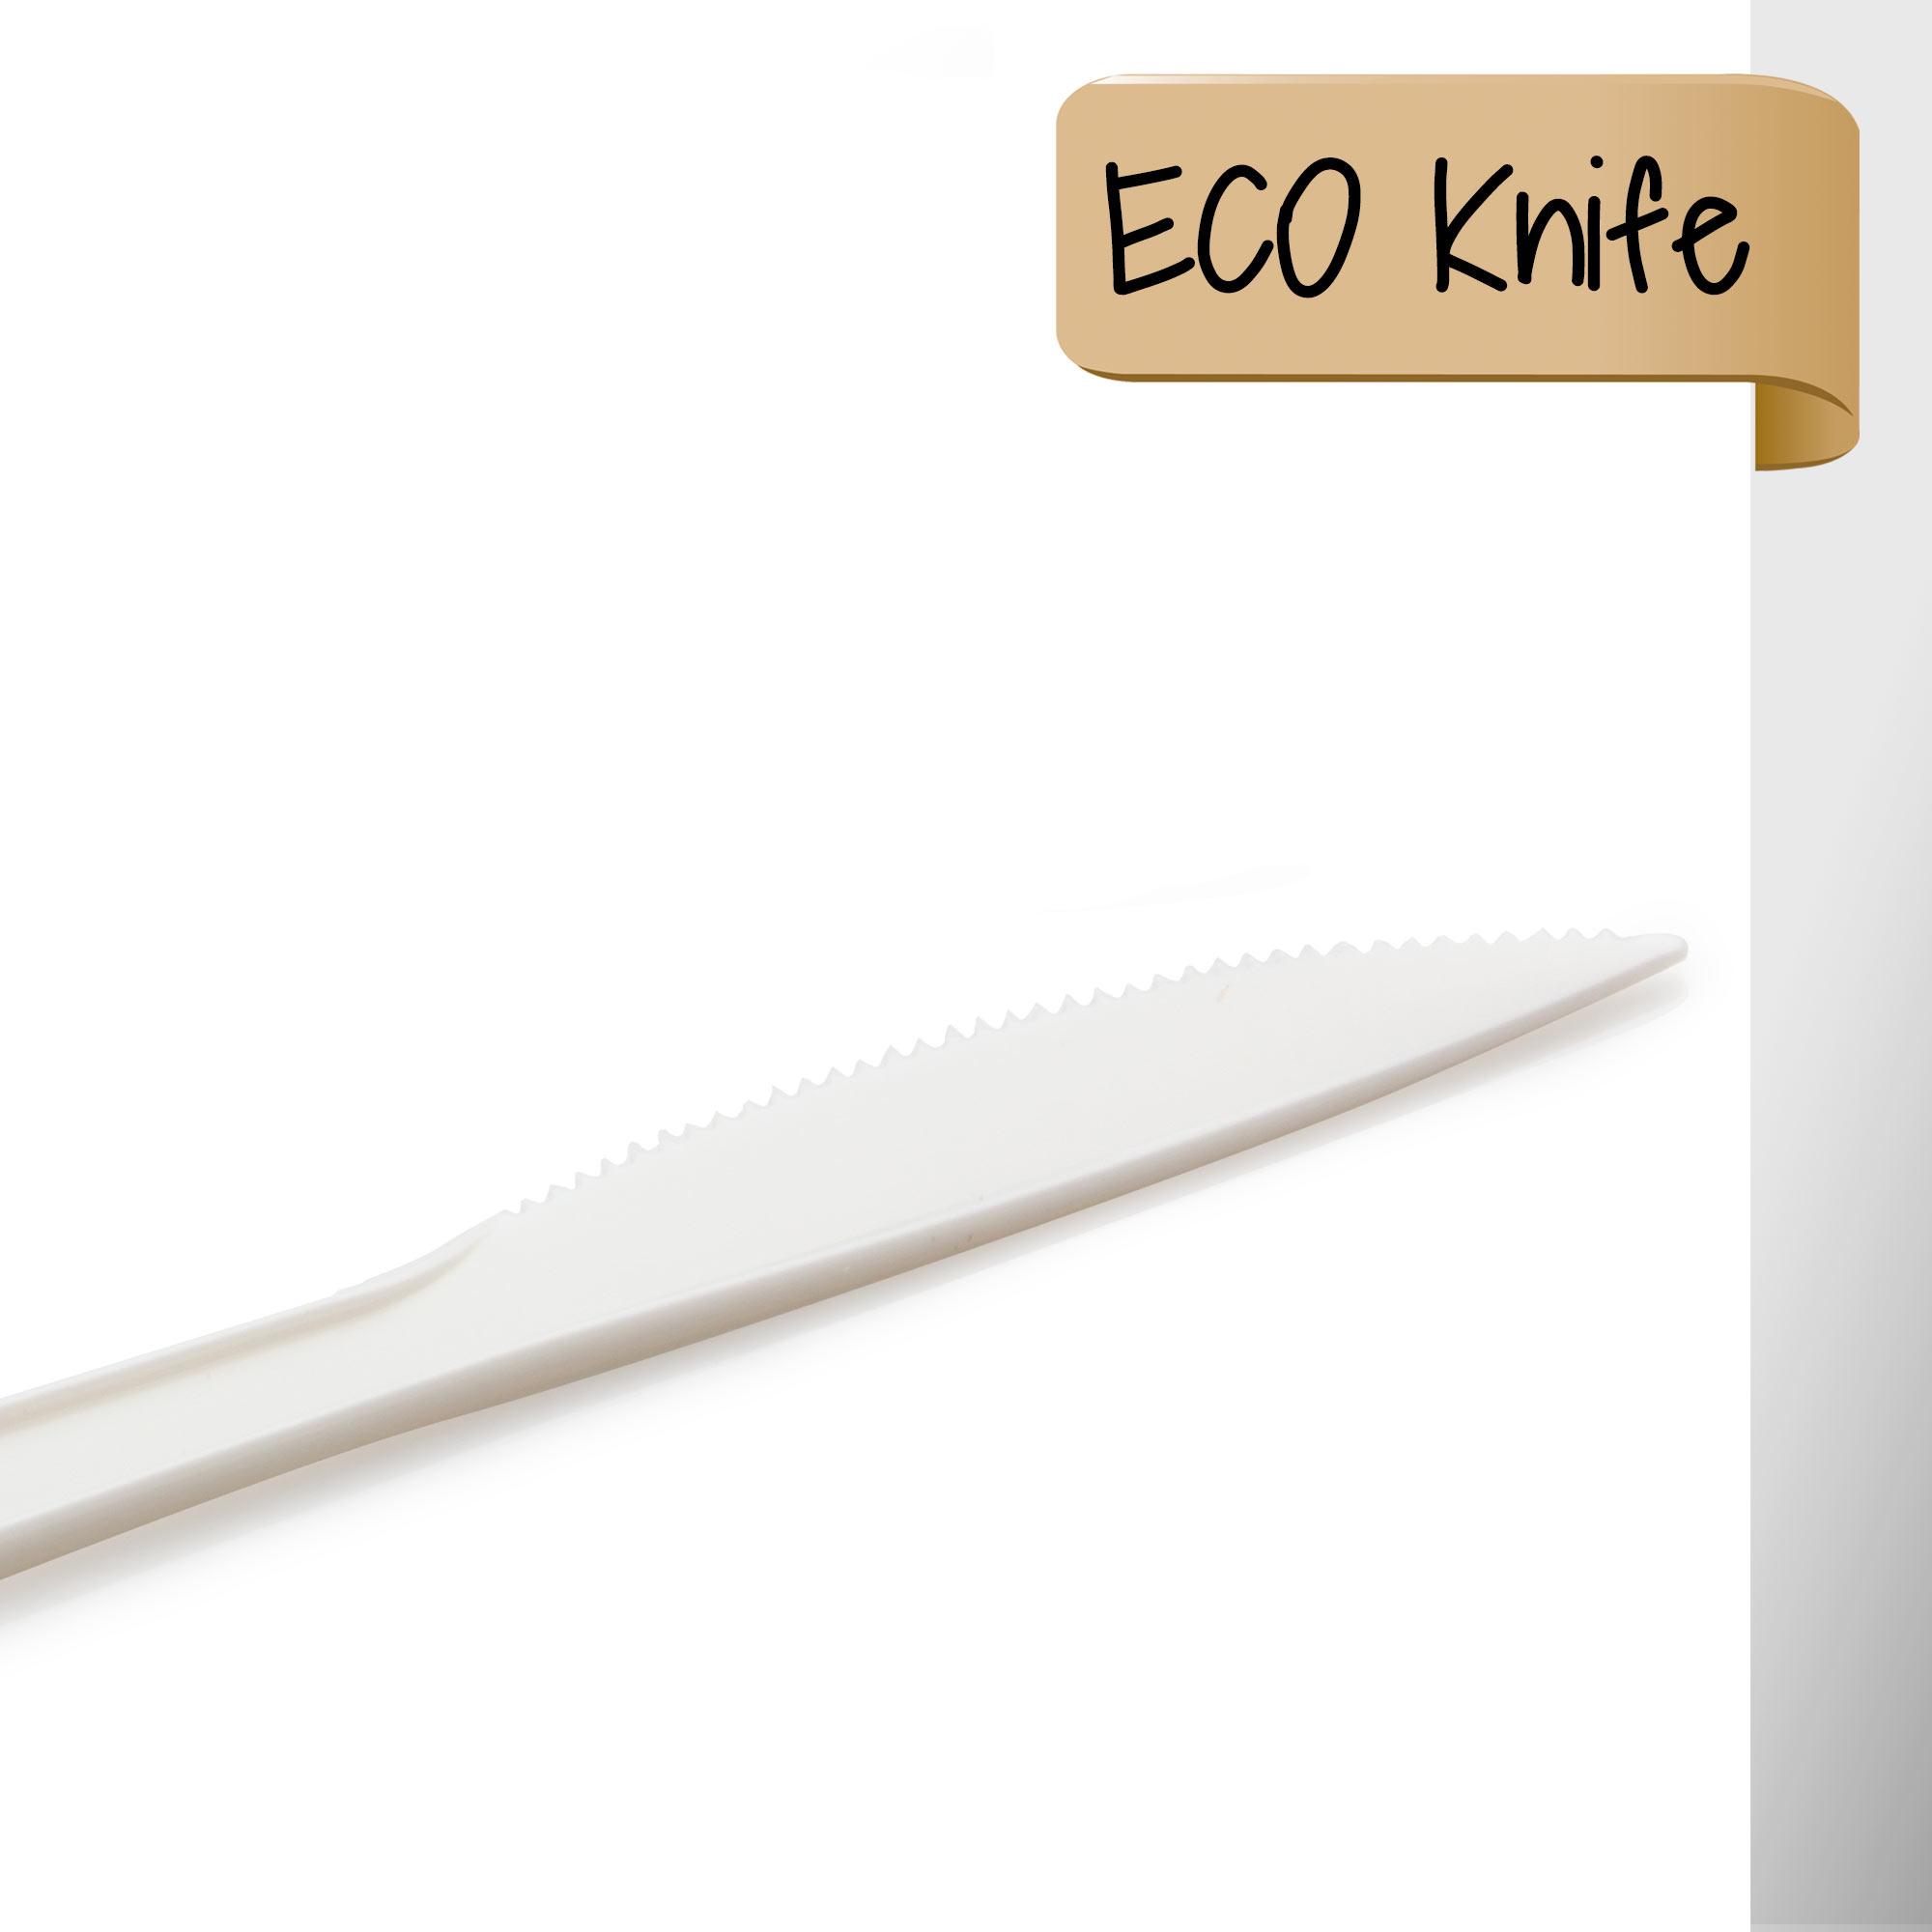 CPLA Knife - Biodegradable Knife